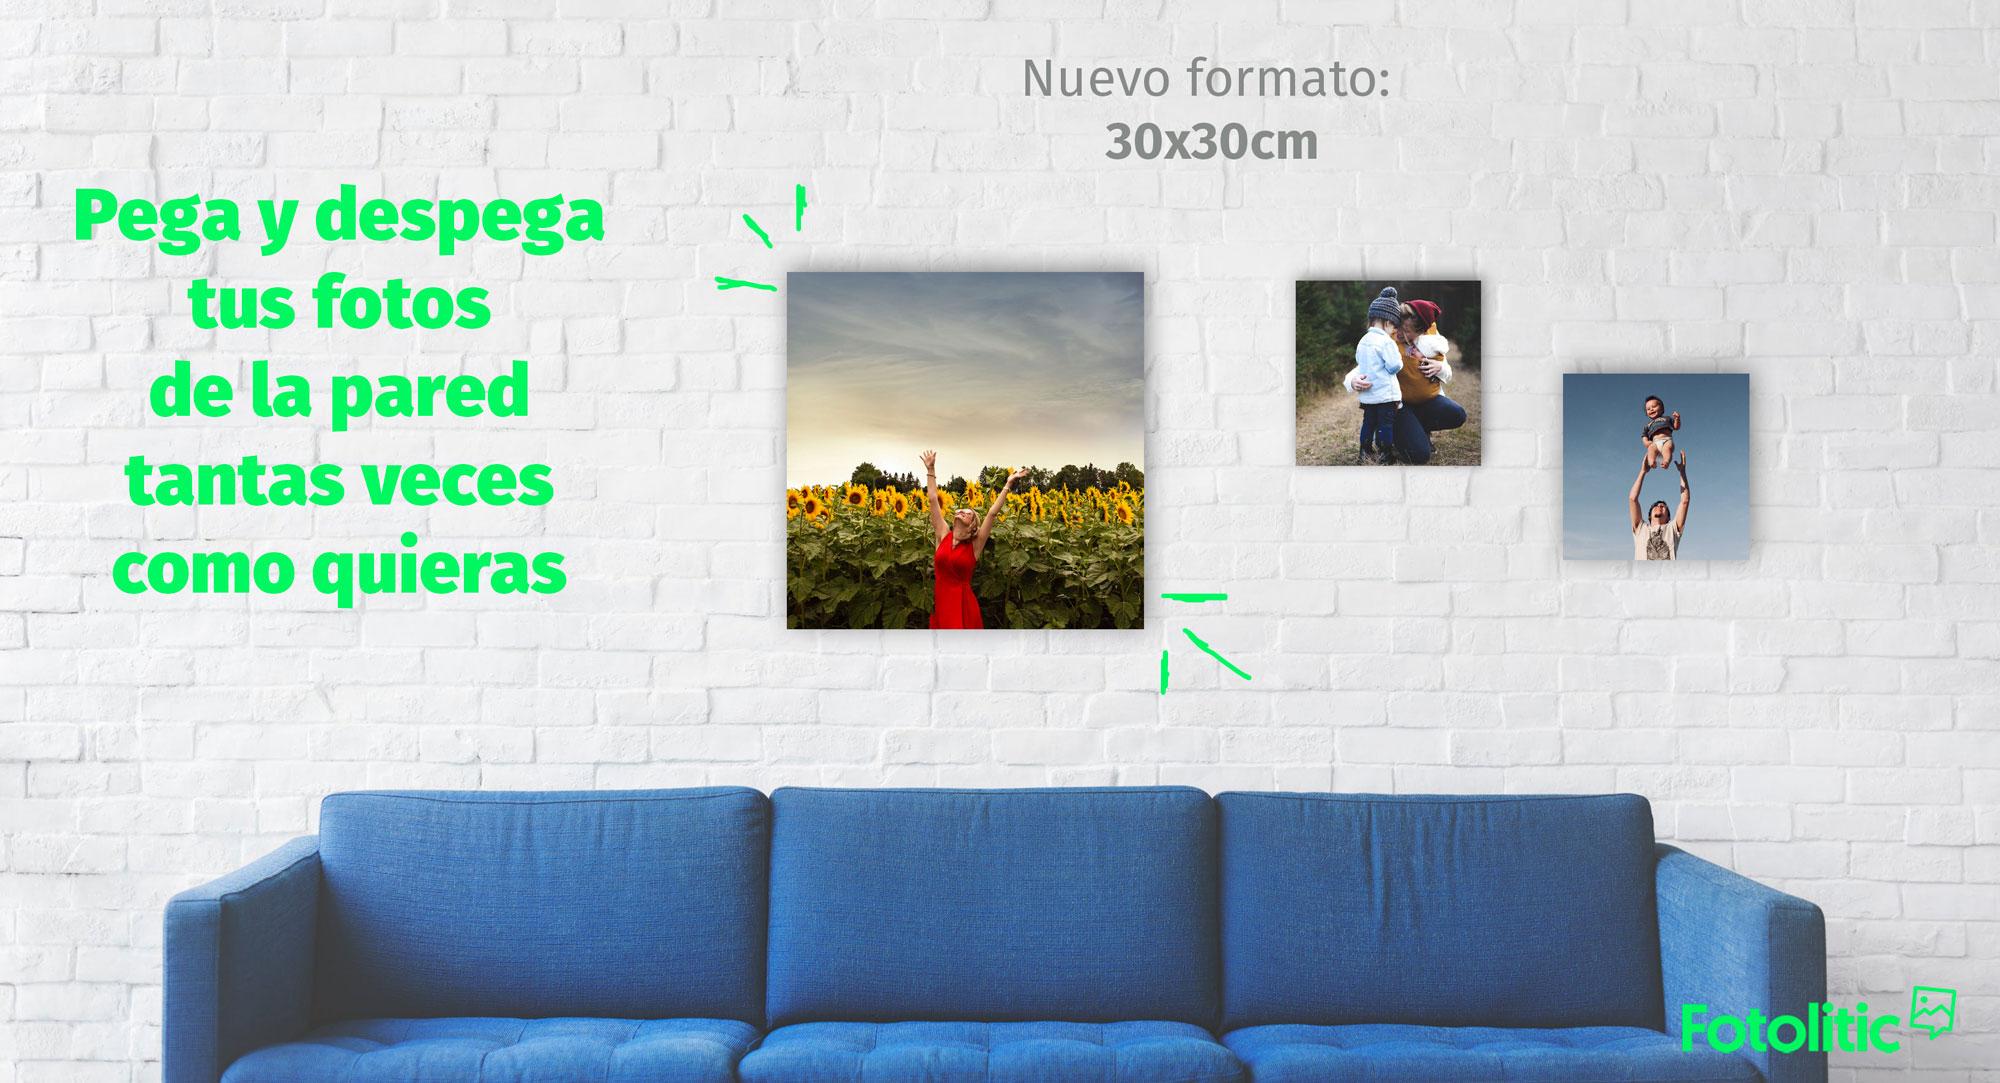 imprimir_fotos_en_madera_por_whatsapp.jpg